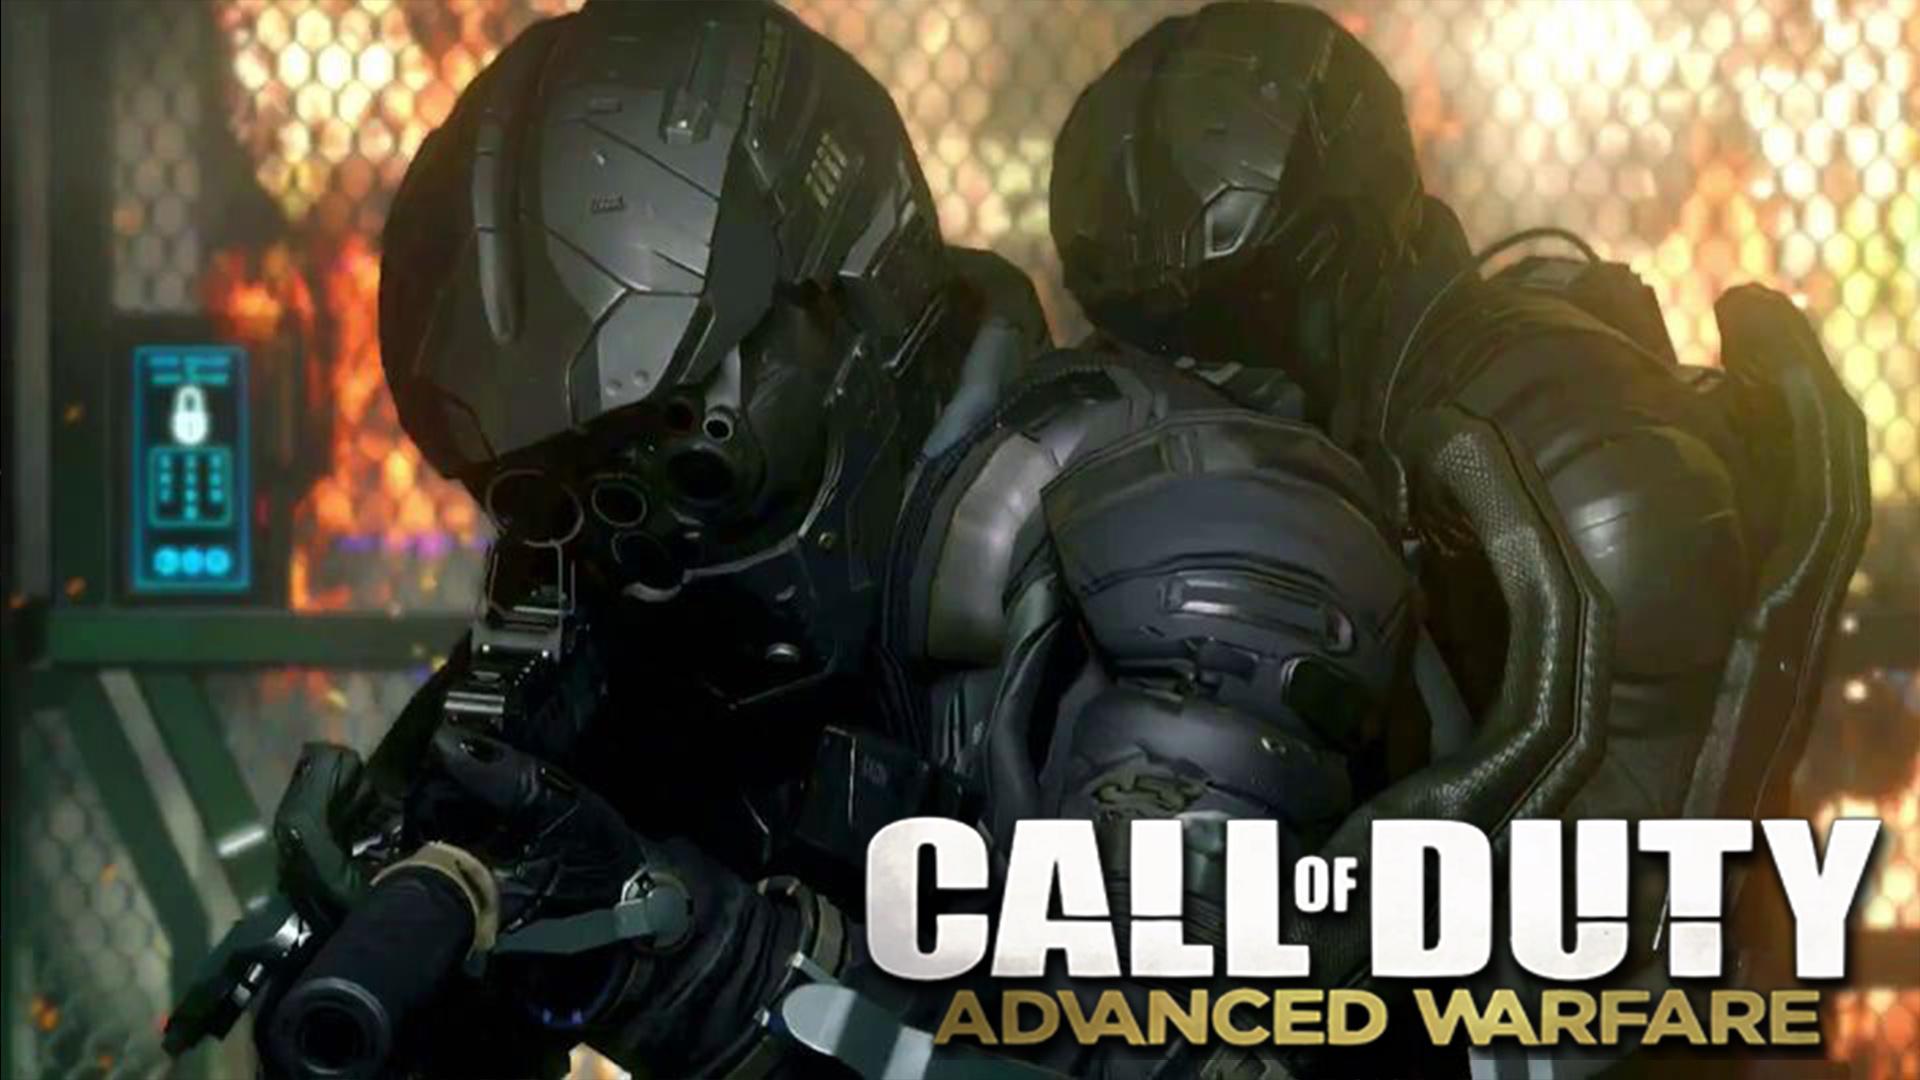 call of duty advanced warfare jeux video fond ecran wallpaper 22 1920x1080